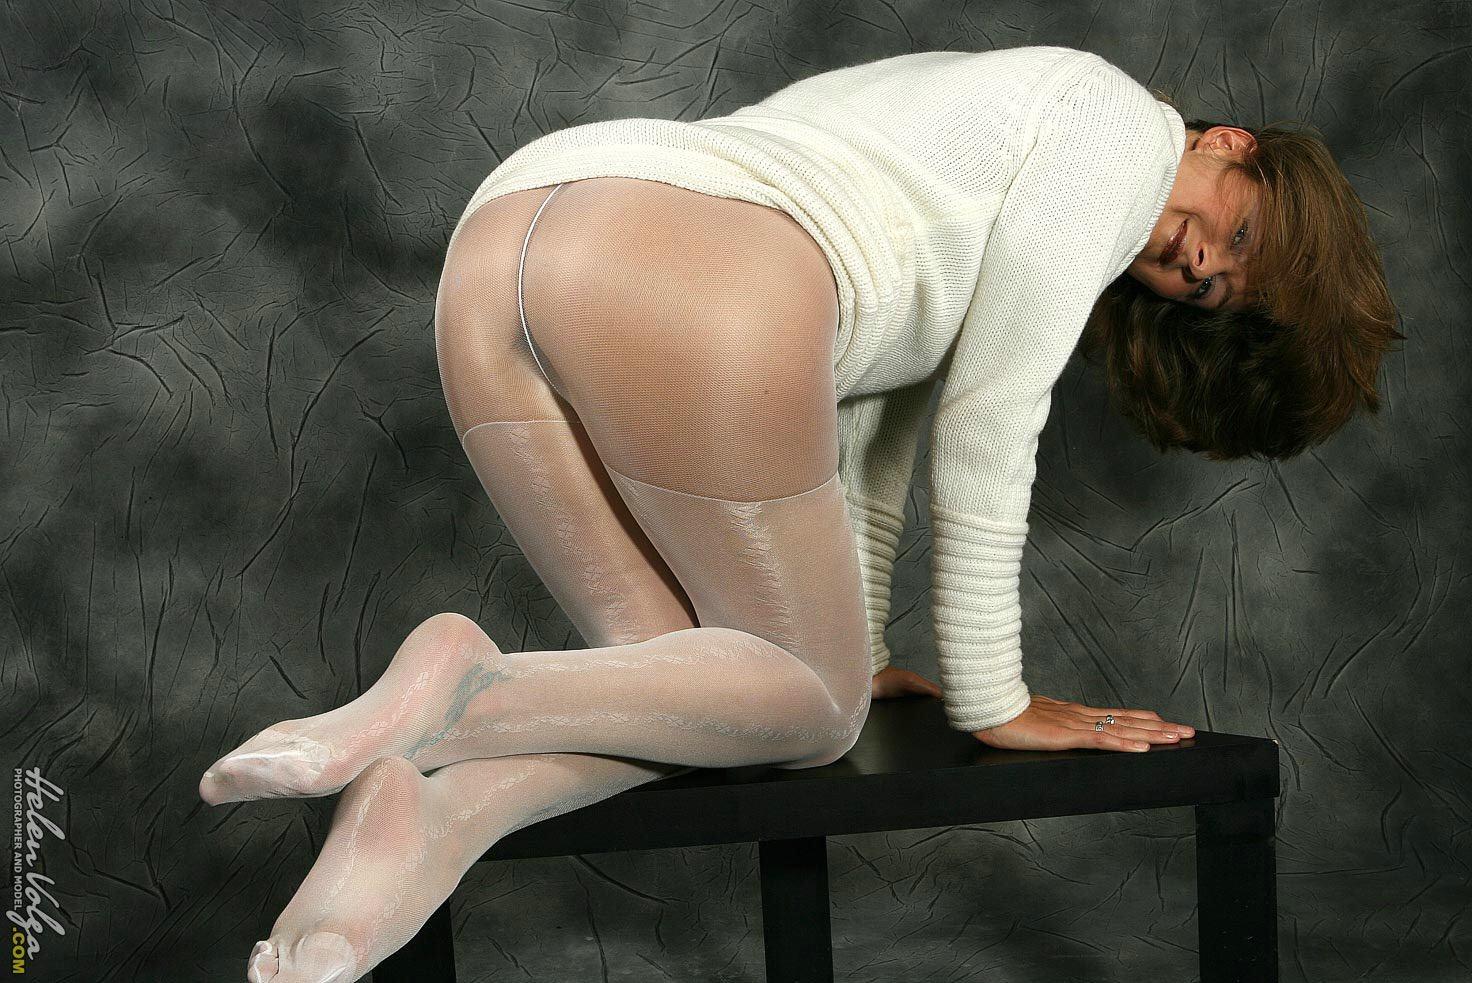 Russian girl models pantyhose